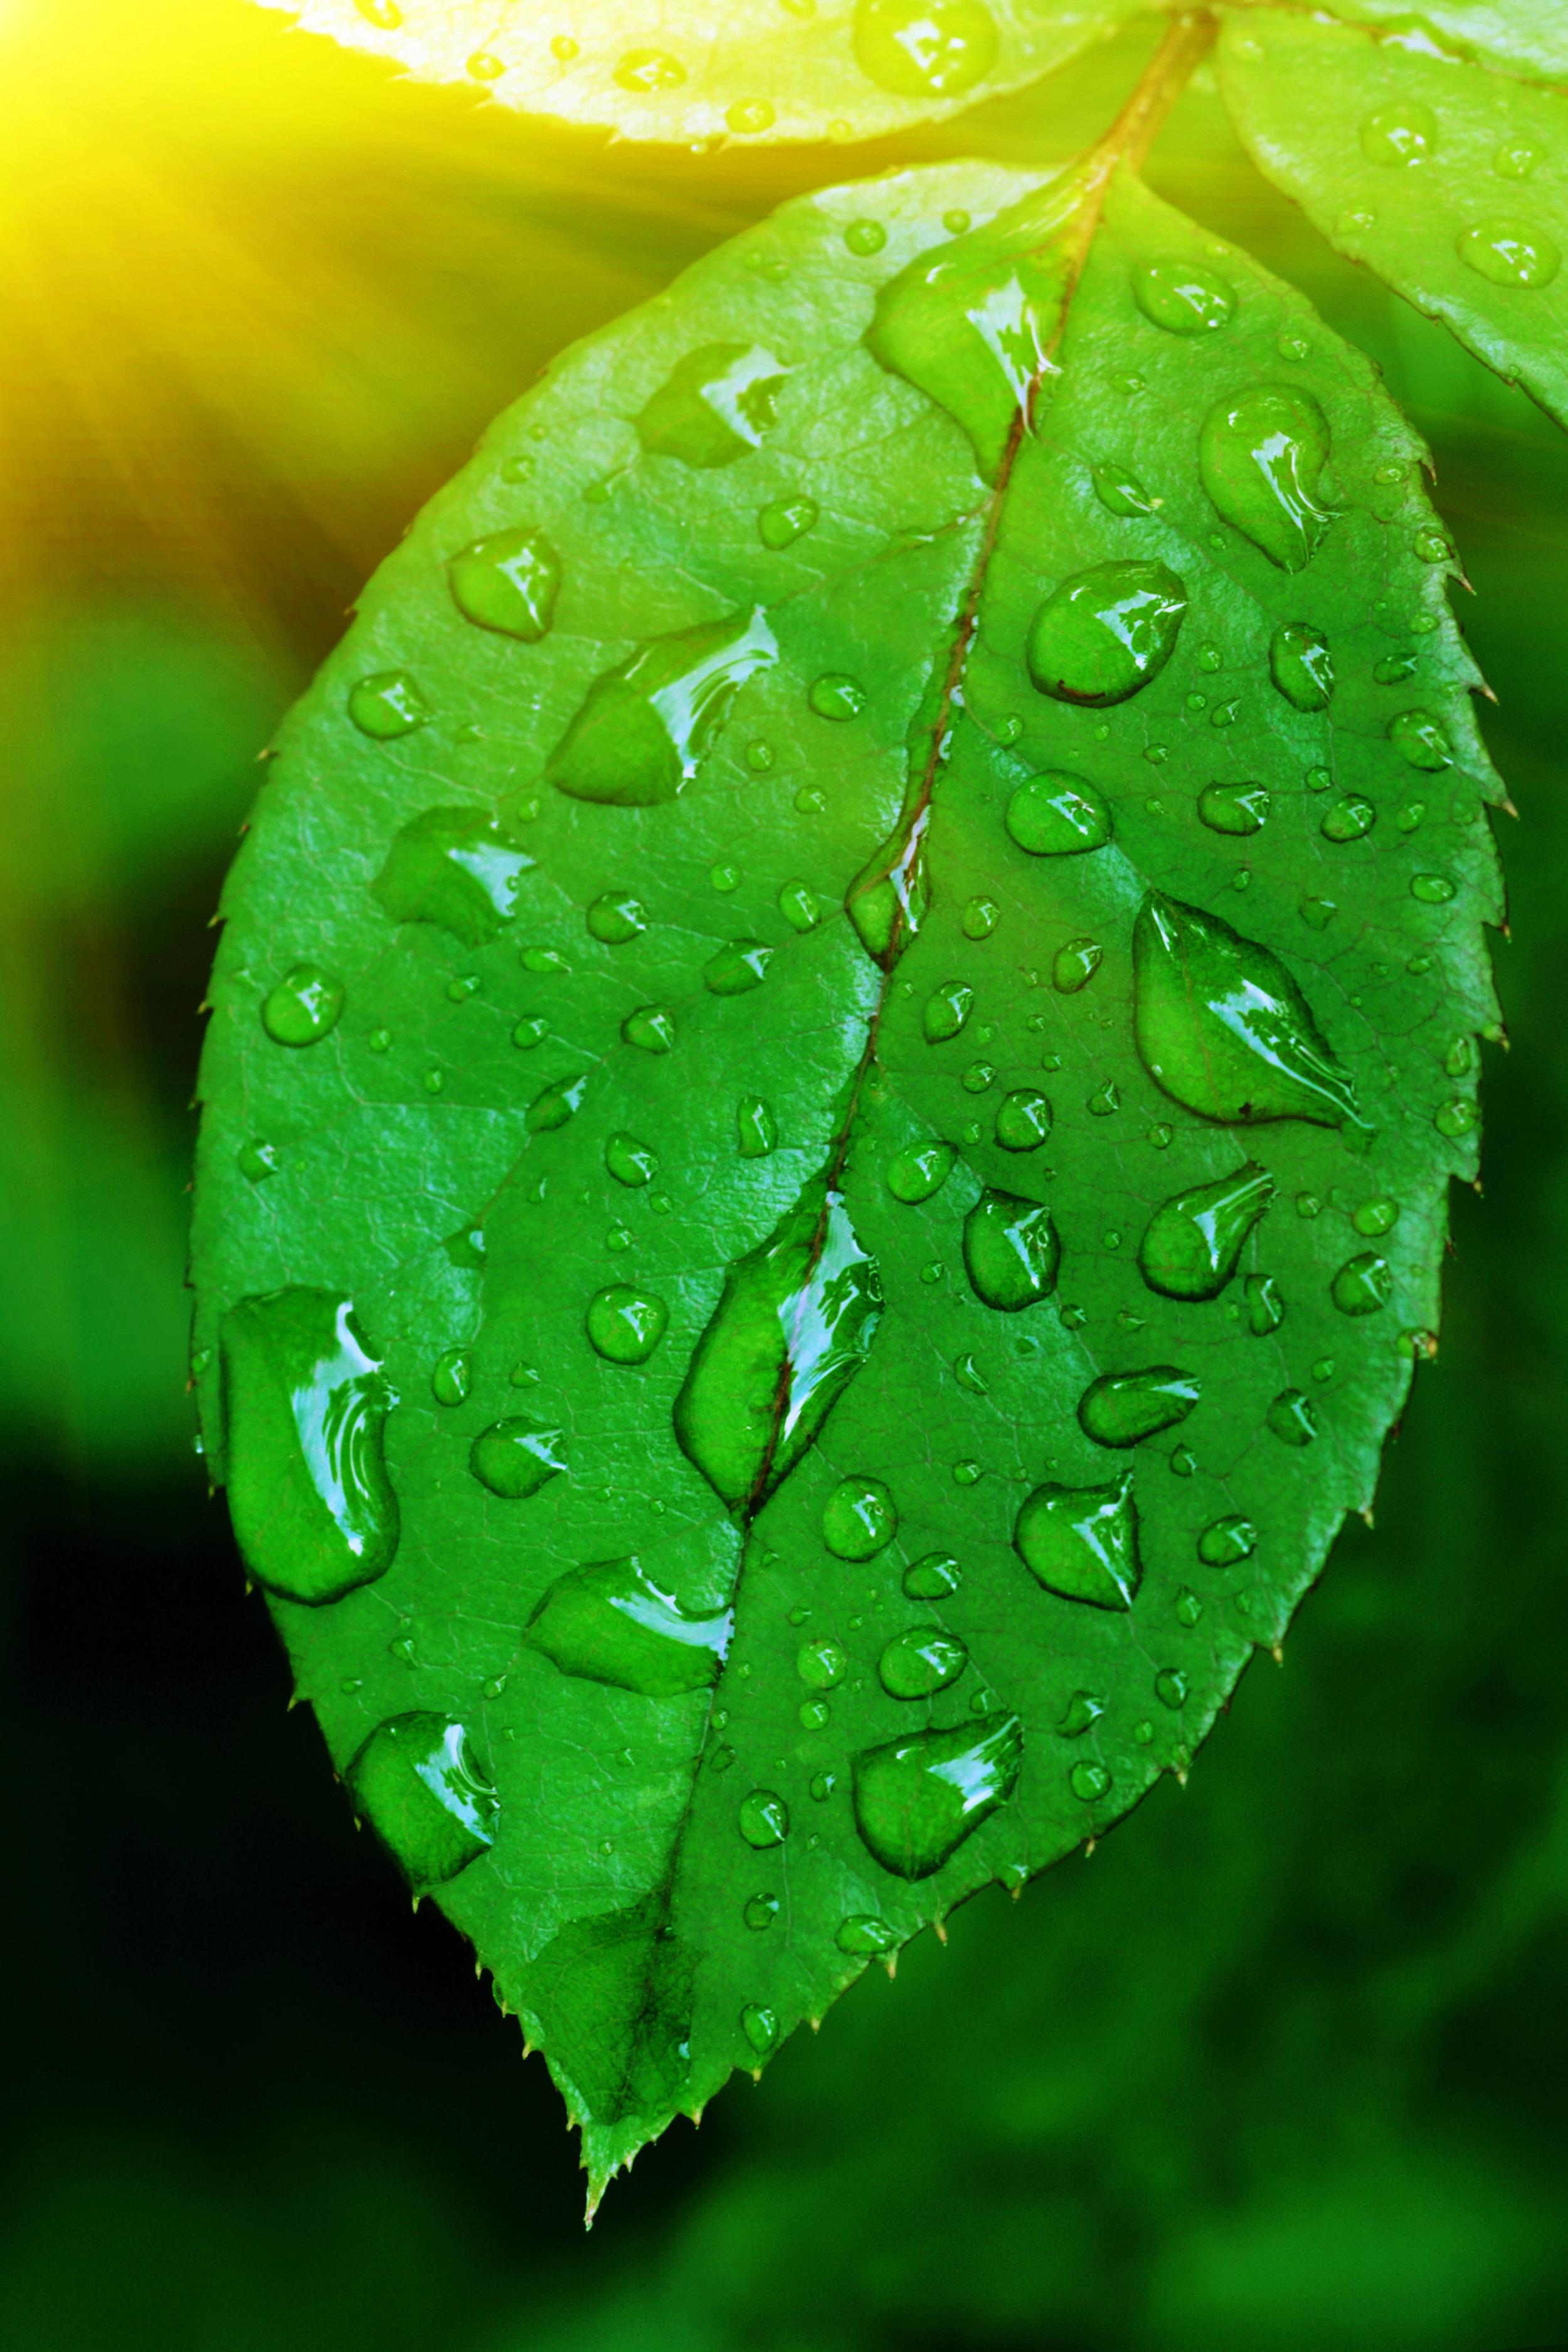 leaf-water-rain-droplets-leaves-texture-image-1-929.jpg